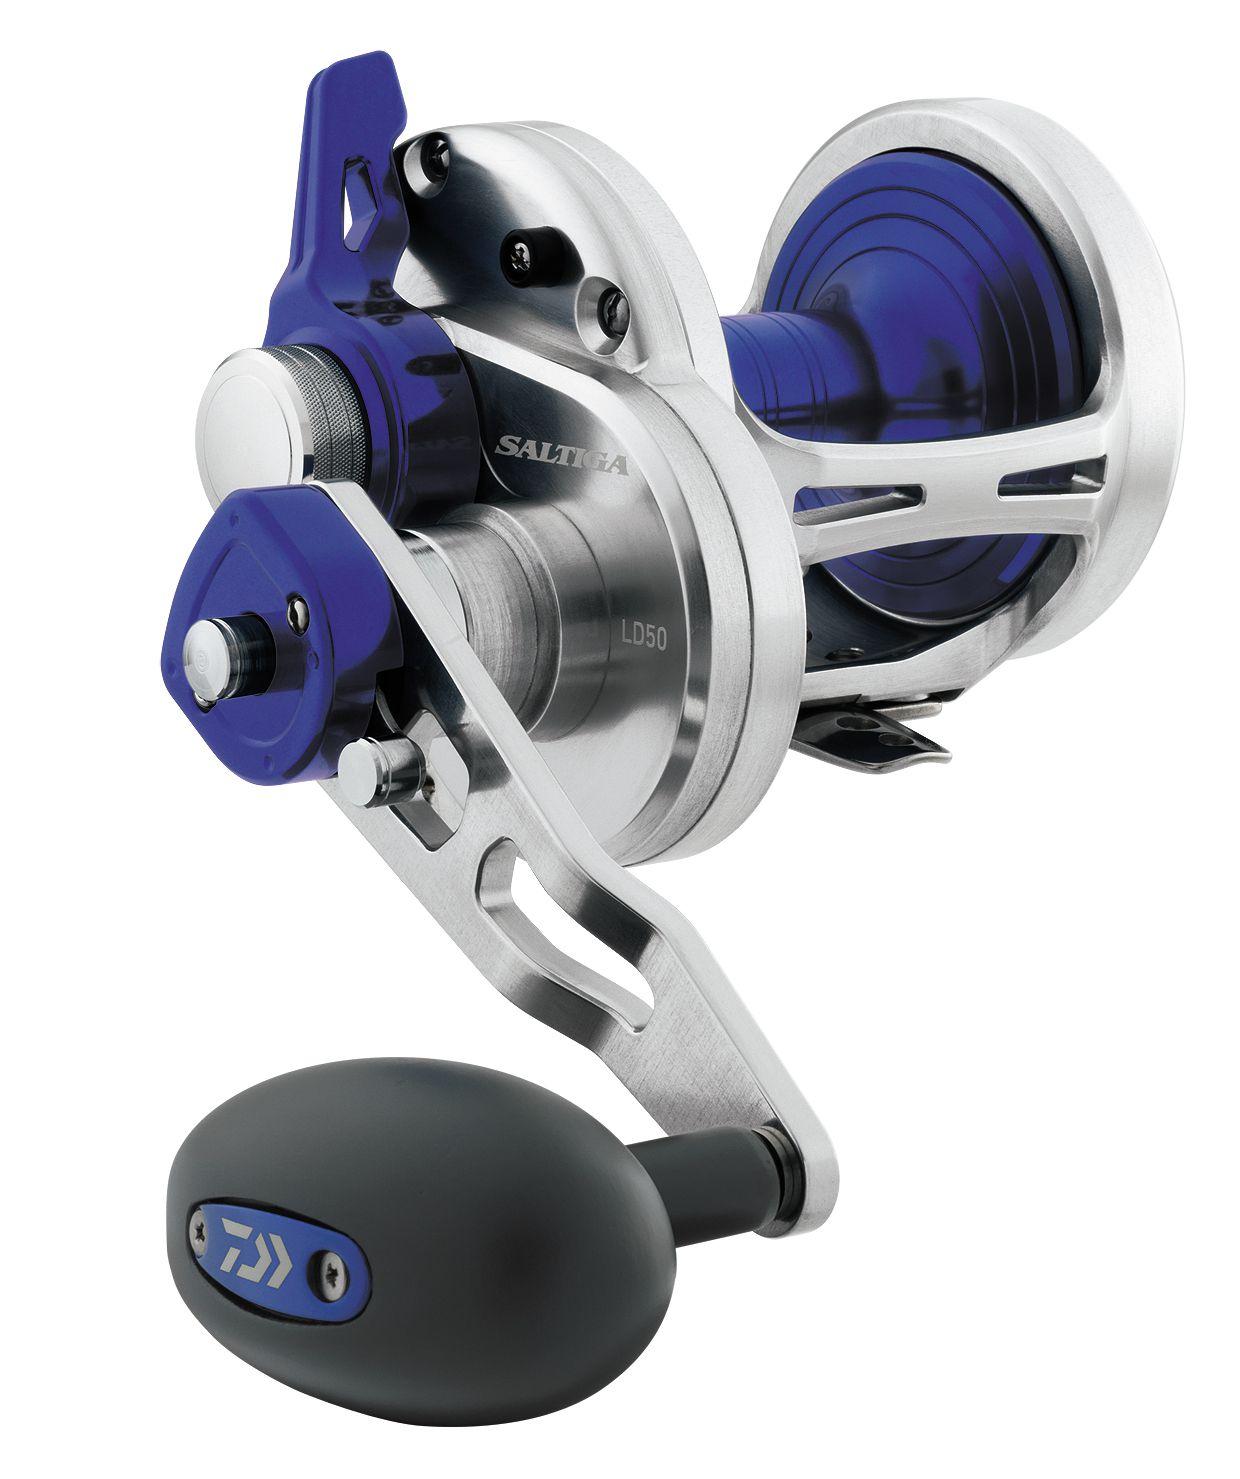 Best Offshore Reels, 50 lb Fishing Reels | Marlin Magazine